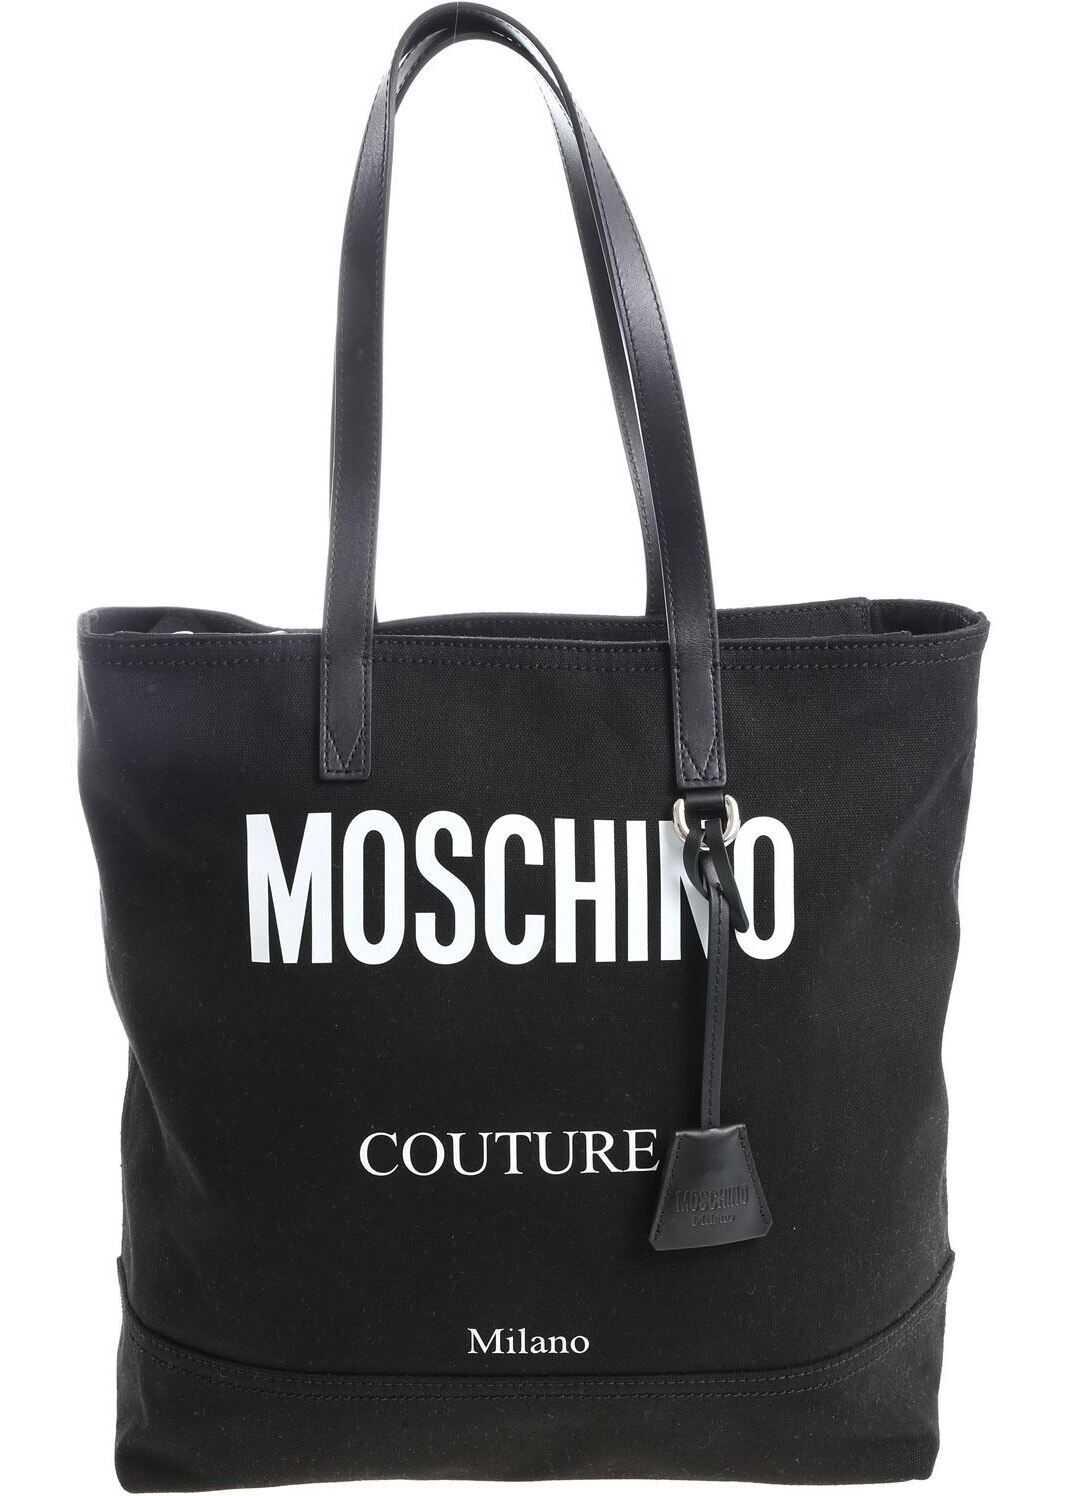 Moschino Black Fabric Shopper With Logo 7423 8203 1555 Black imagine b-mall.ro